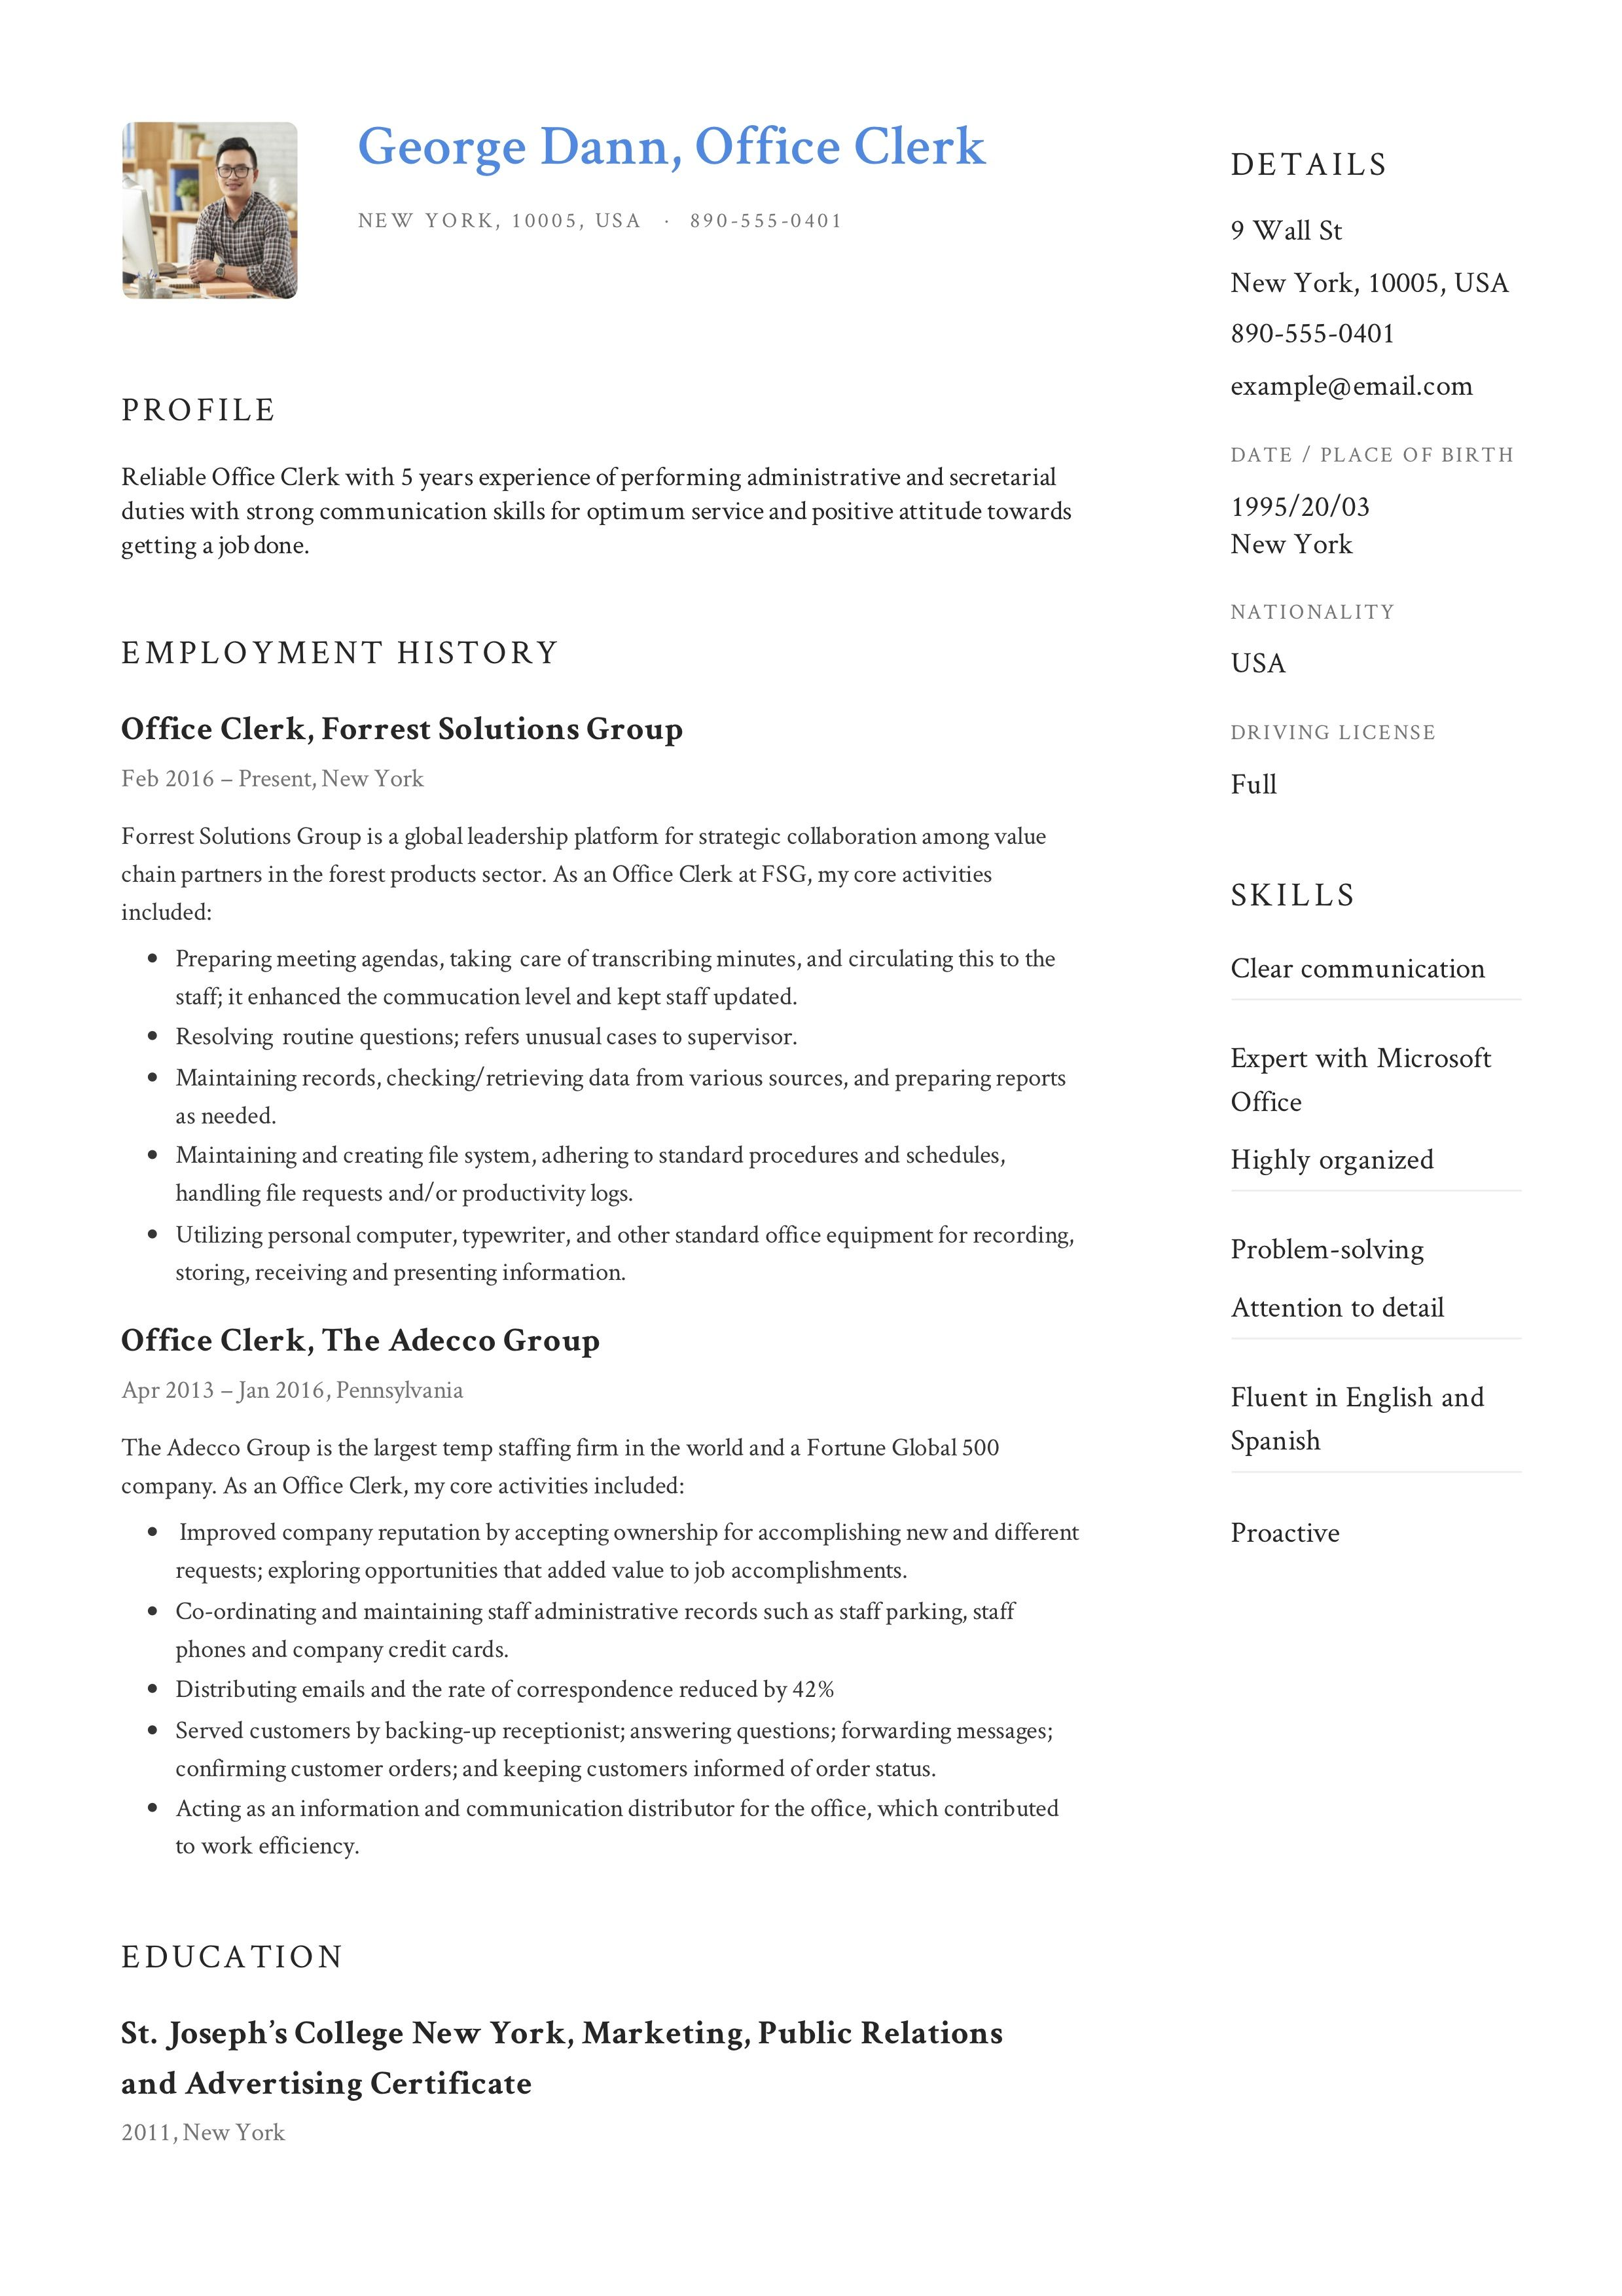 Office Clerk Resume Guide Resume Guide Resume Examples